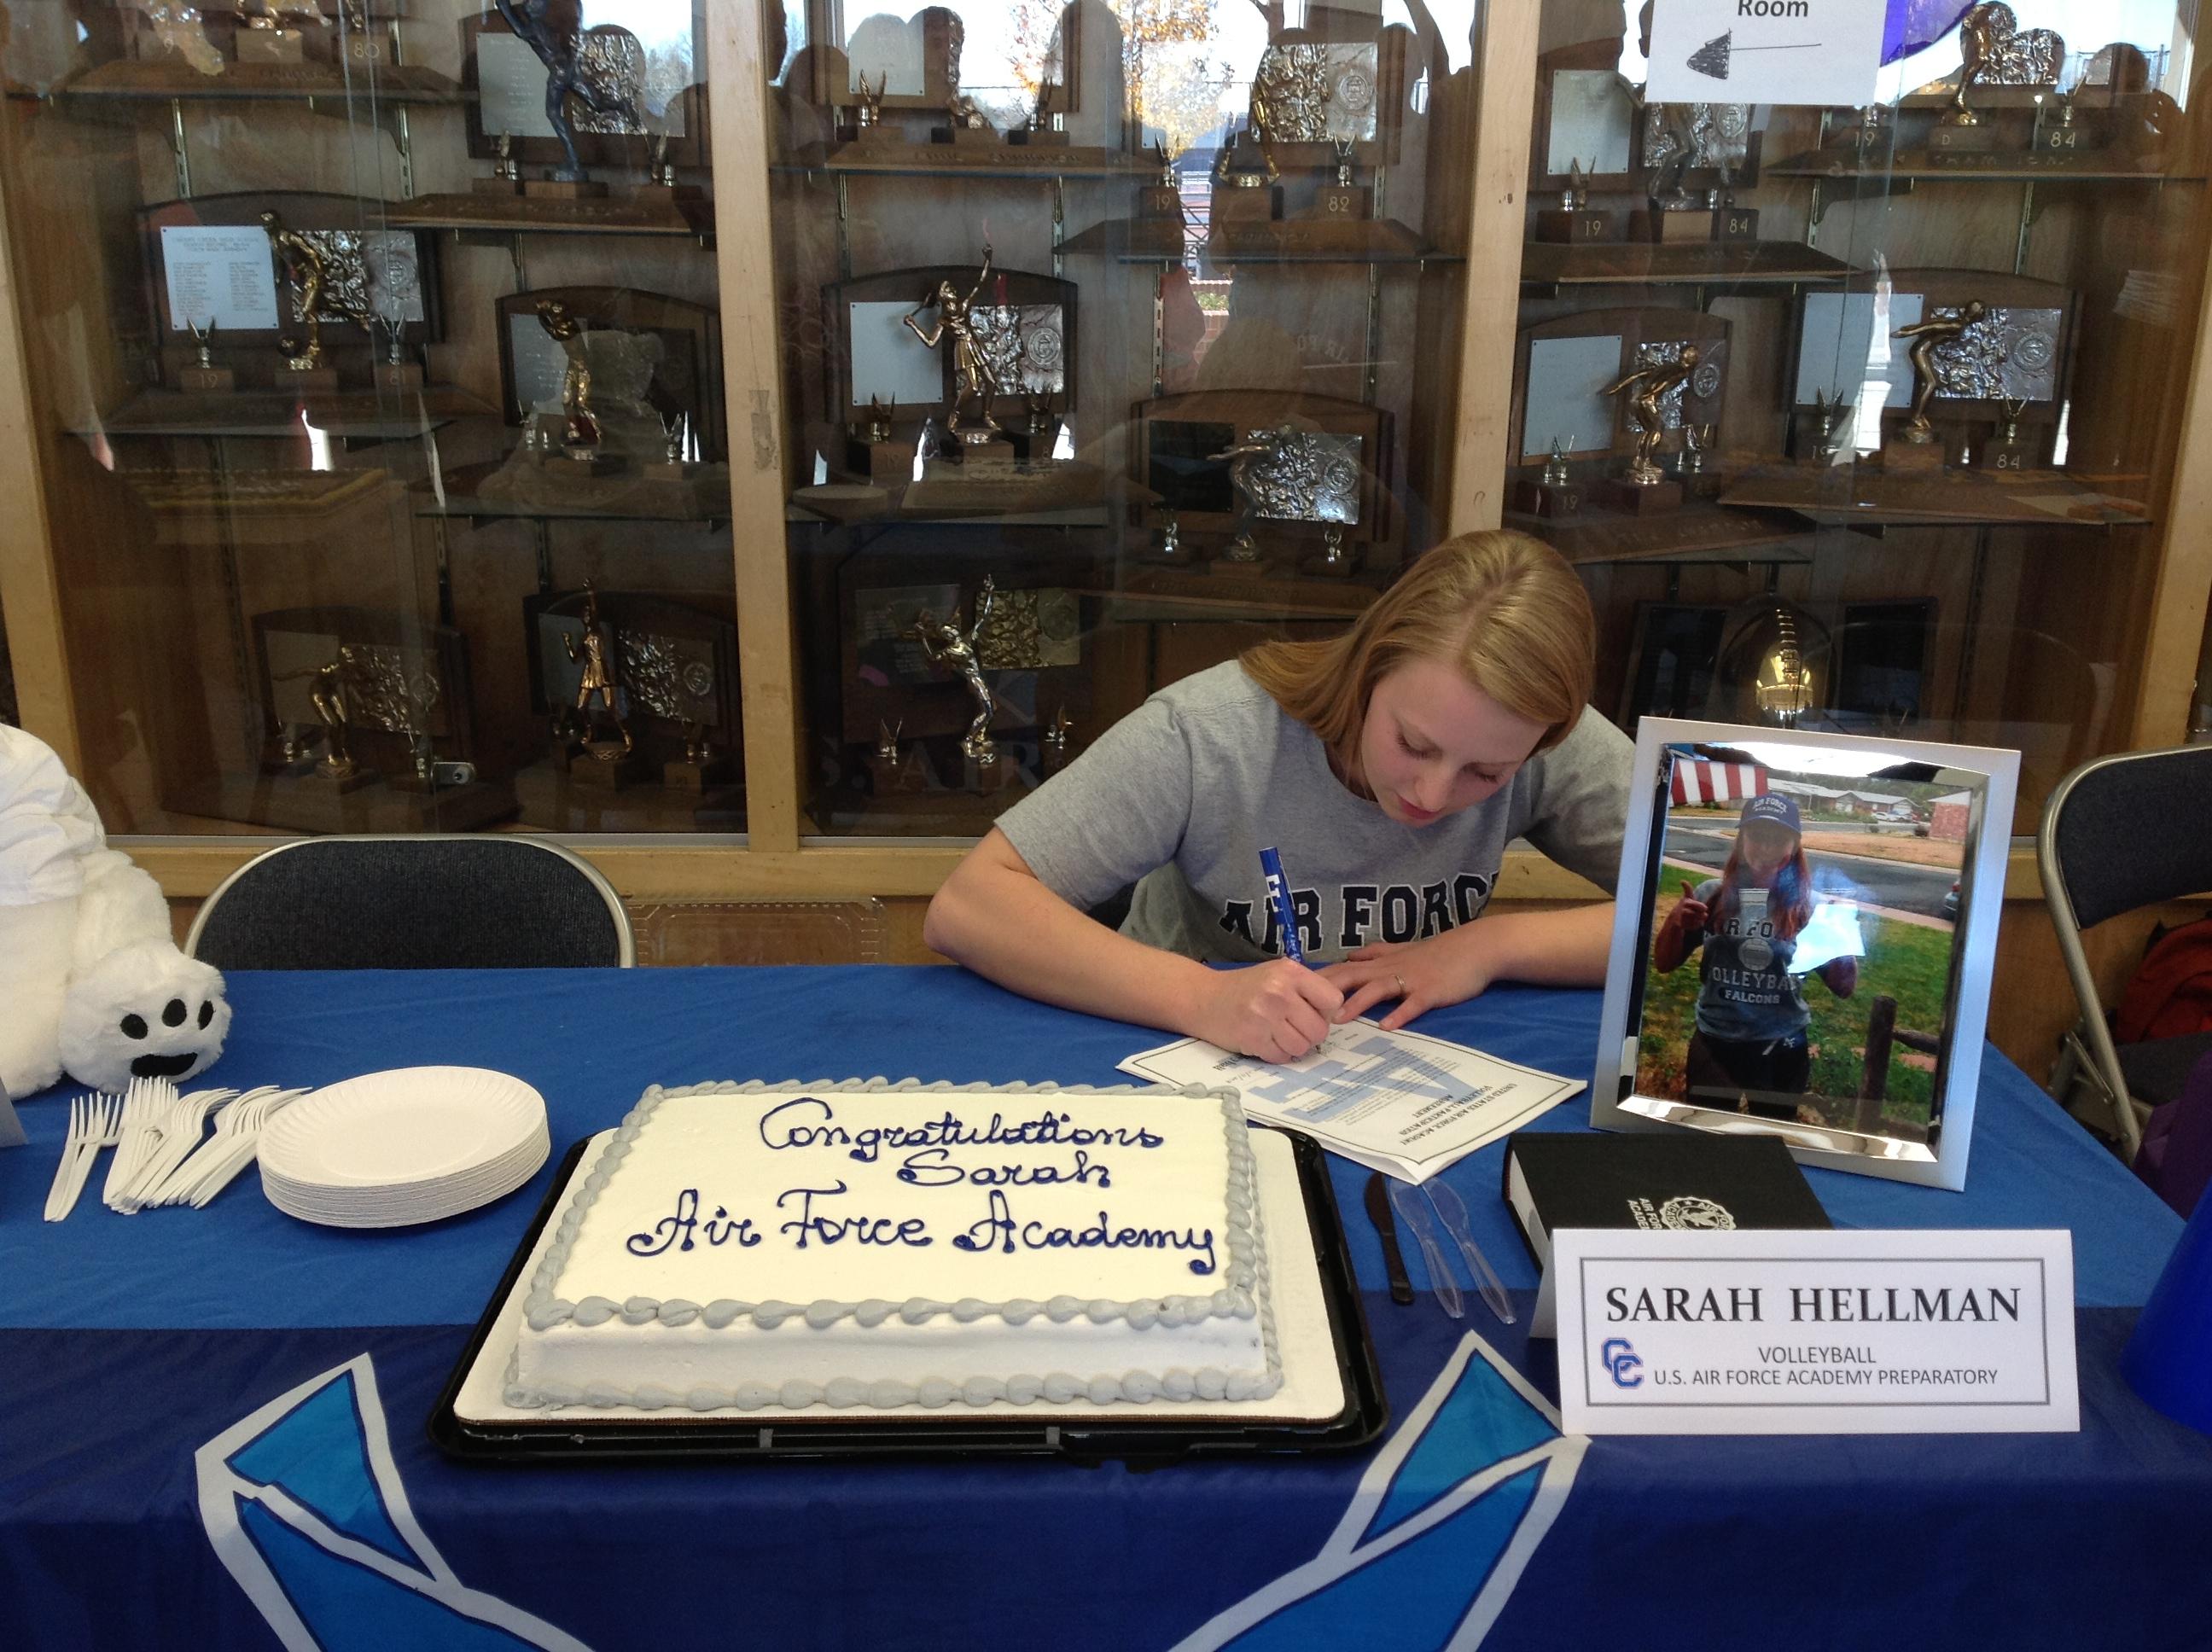 Sarahhellman signs